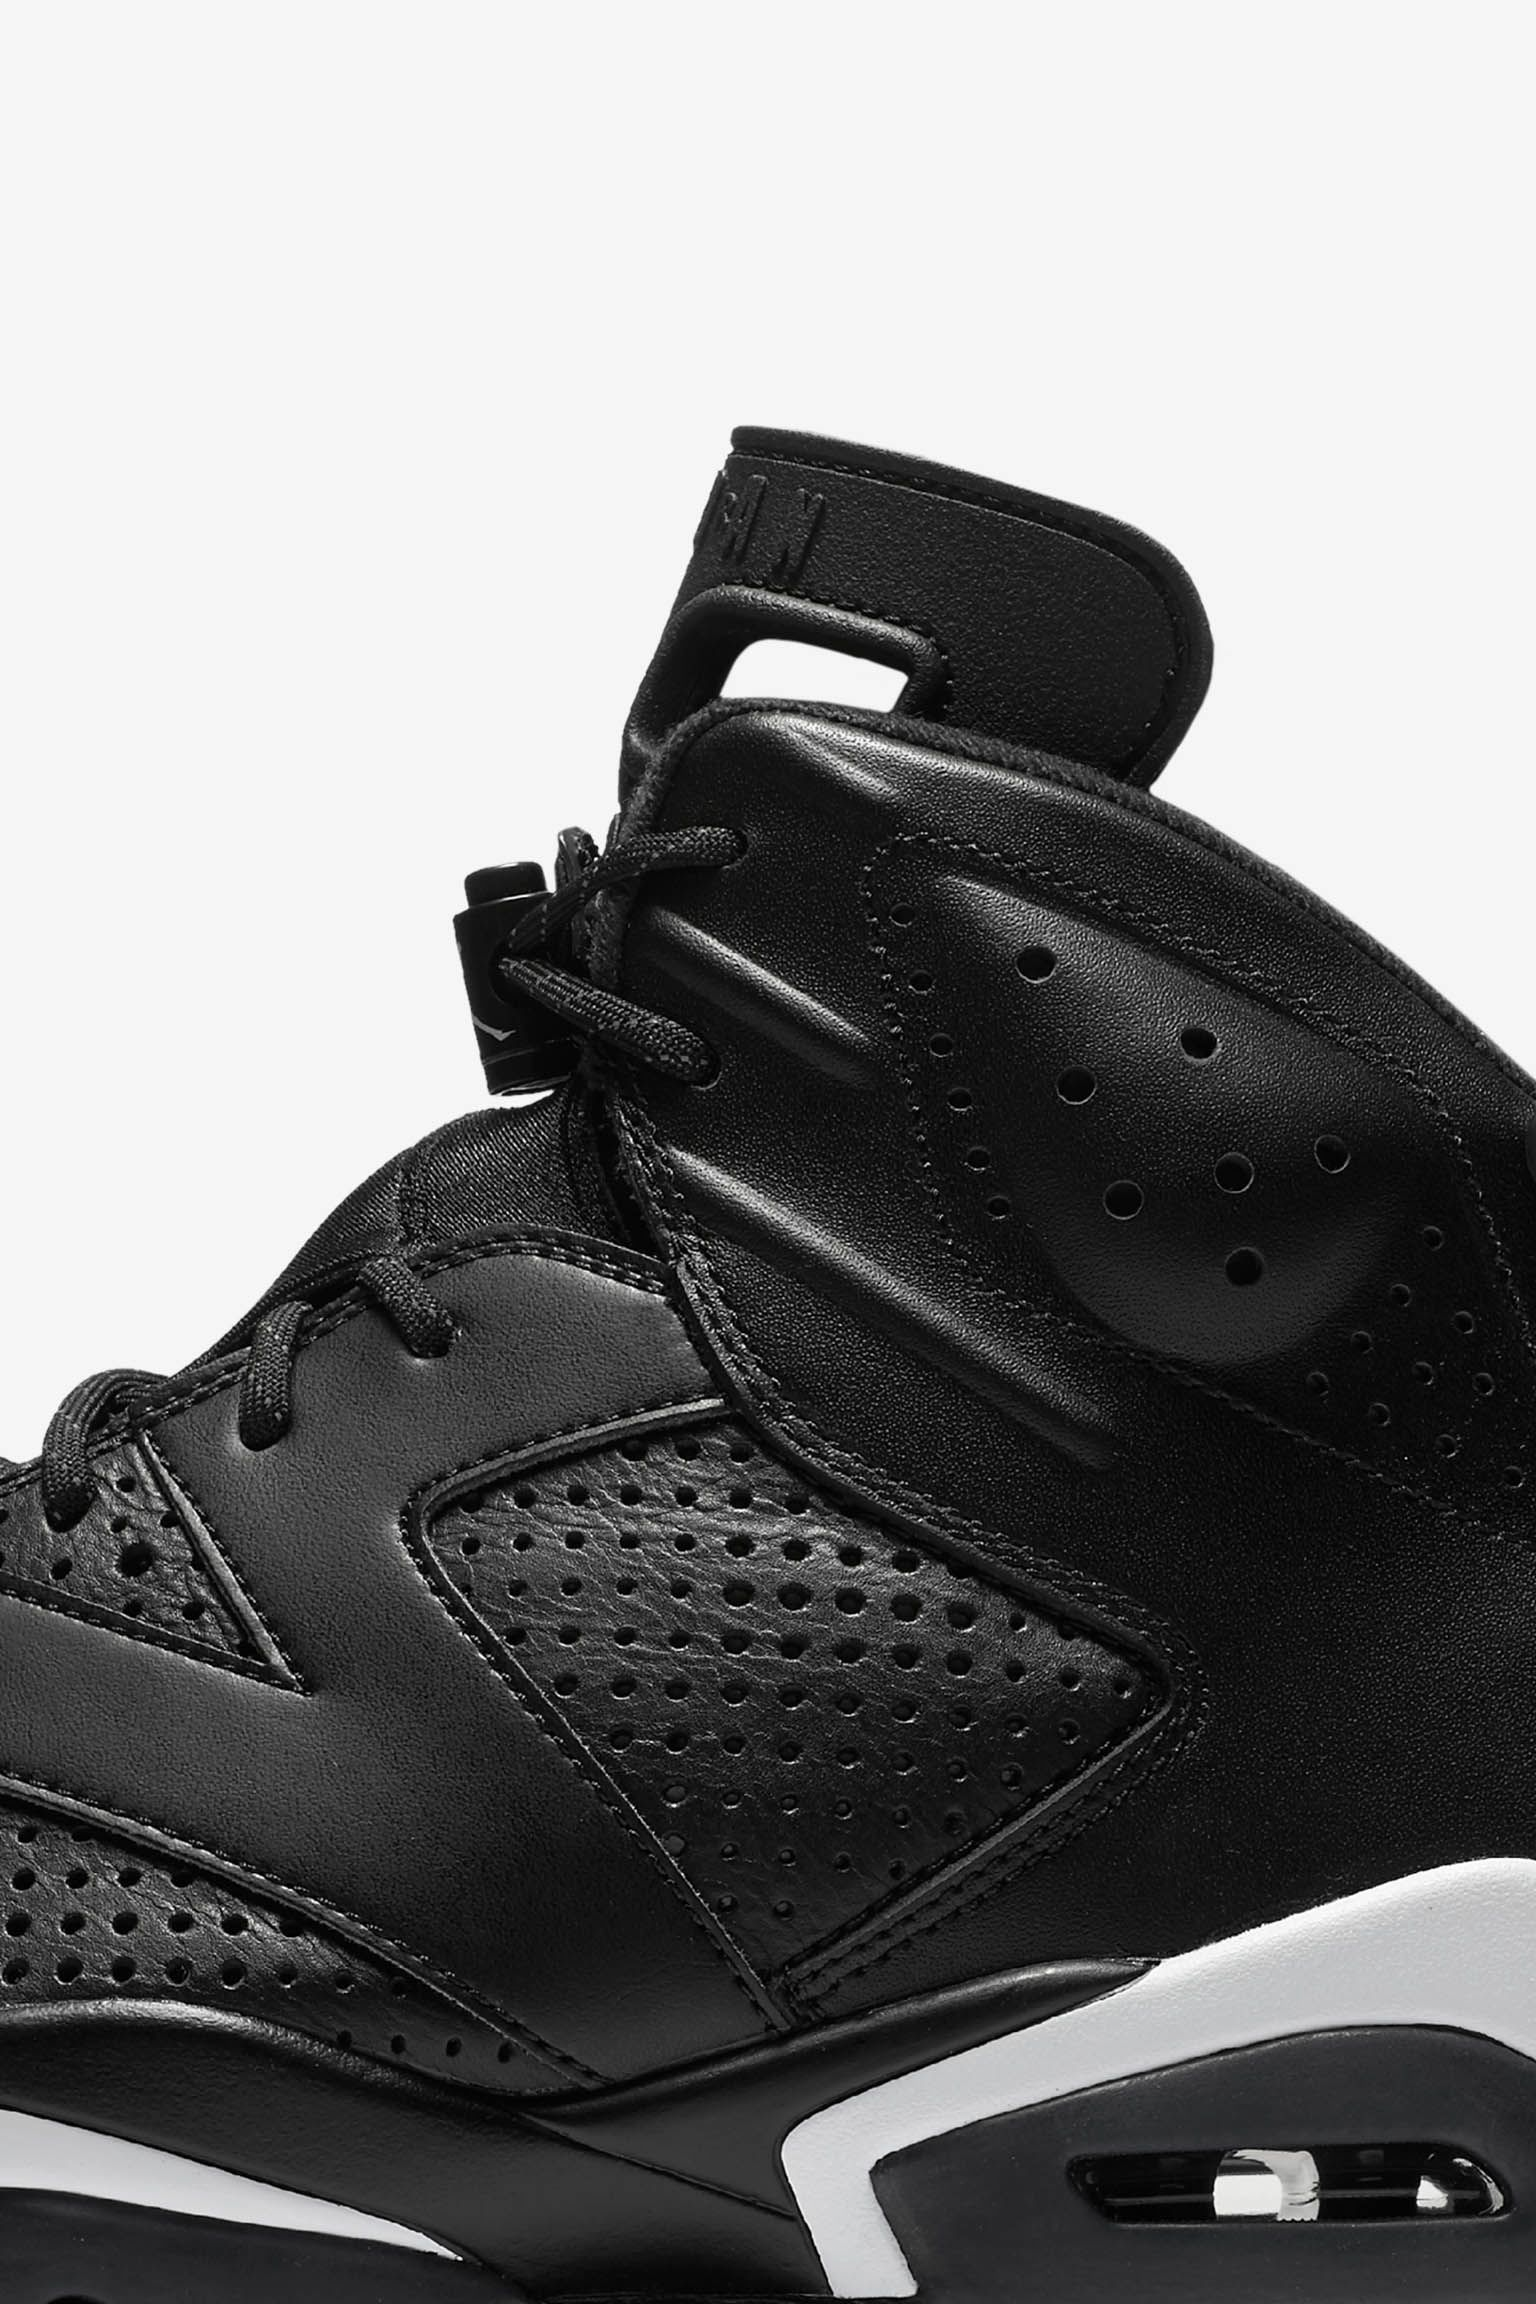 Air Jordan 6 Retro 'Black'